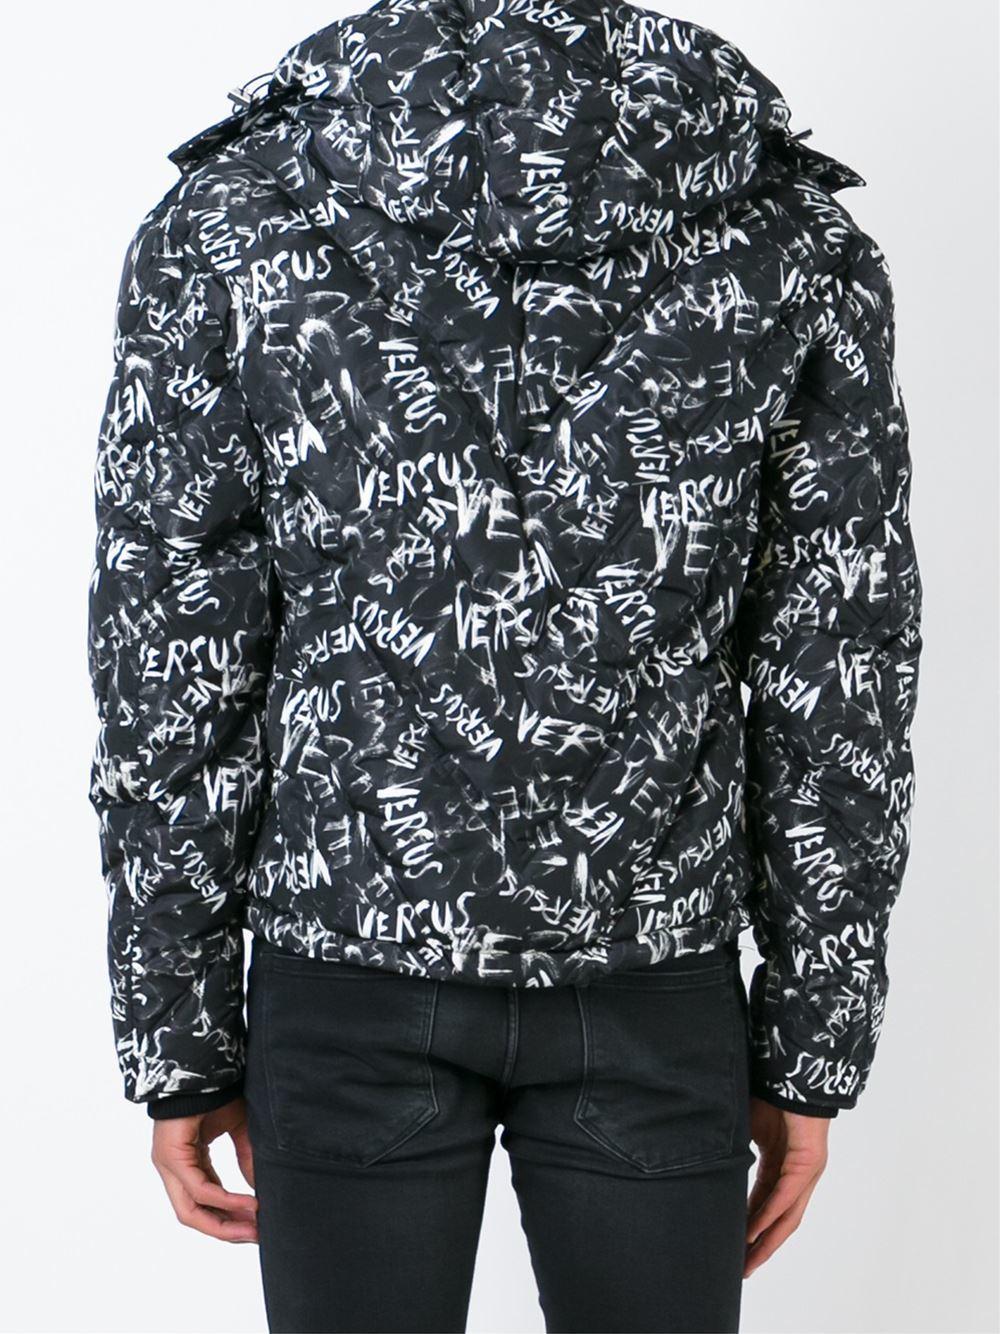 Versus Cotton Allover Logo Print Padded Jacket in Black for Men